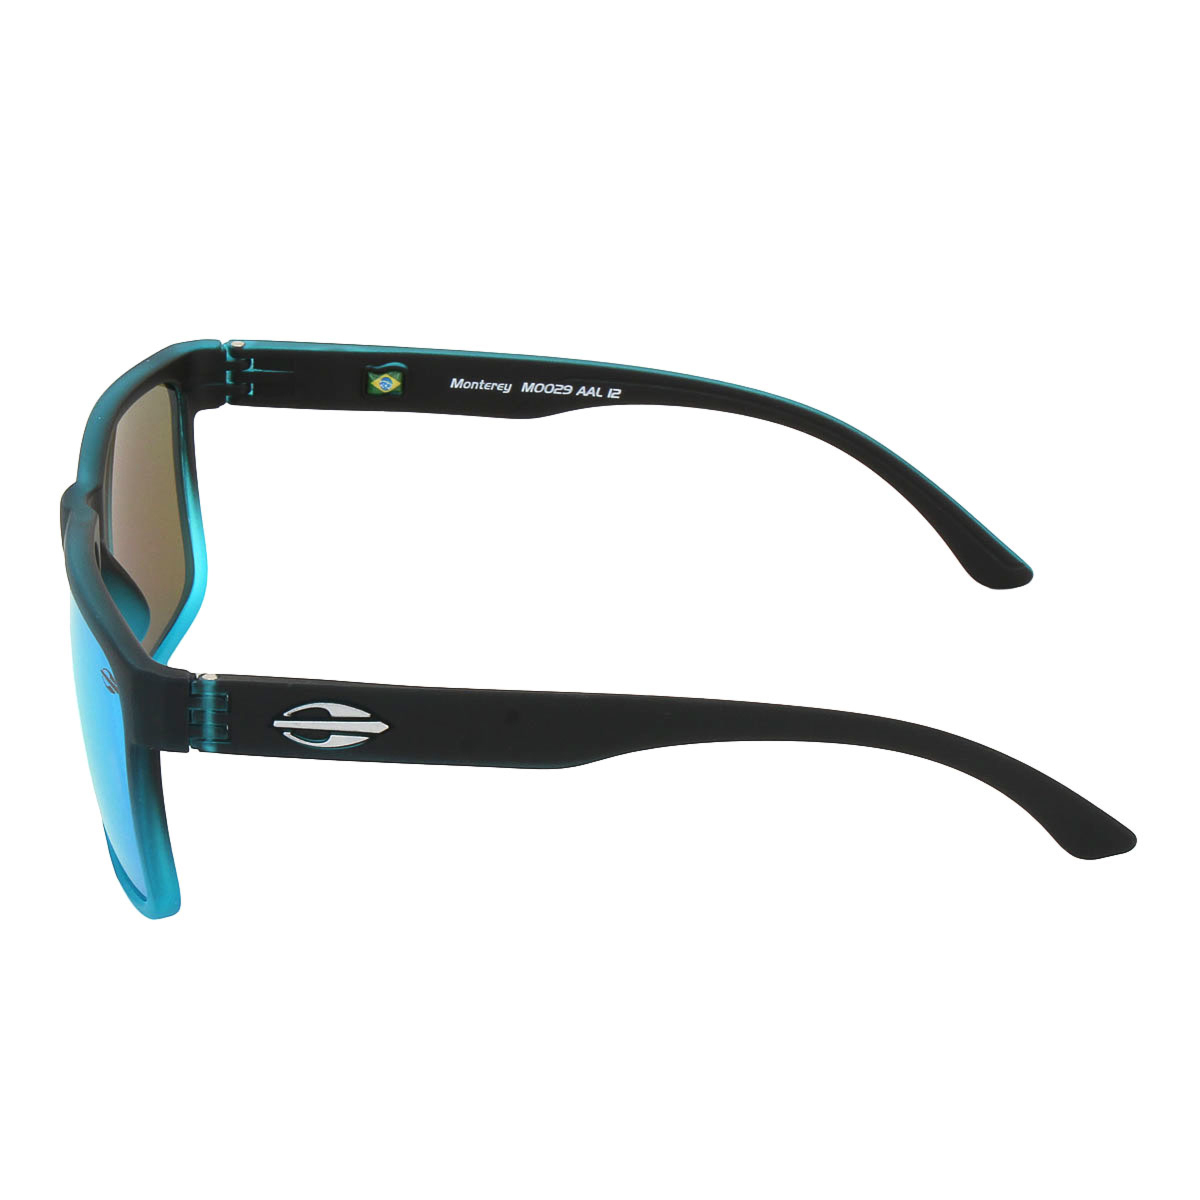 5e4e826779dd8 Óculos Mormaii Monterey Preto Fosco Degradê Azul Lente Azul ref ...